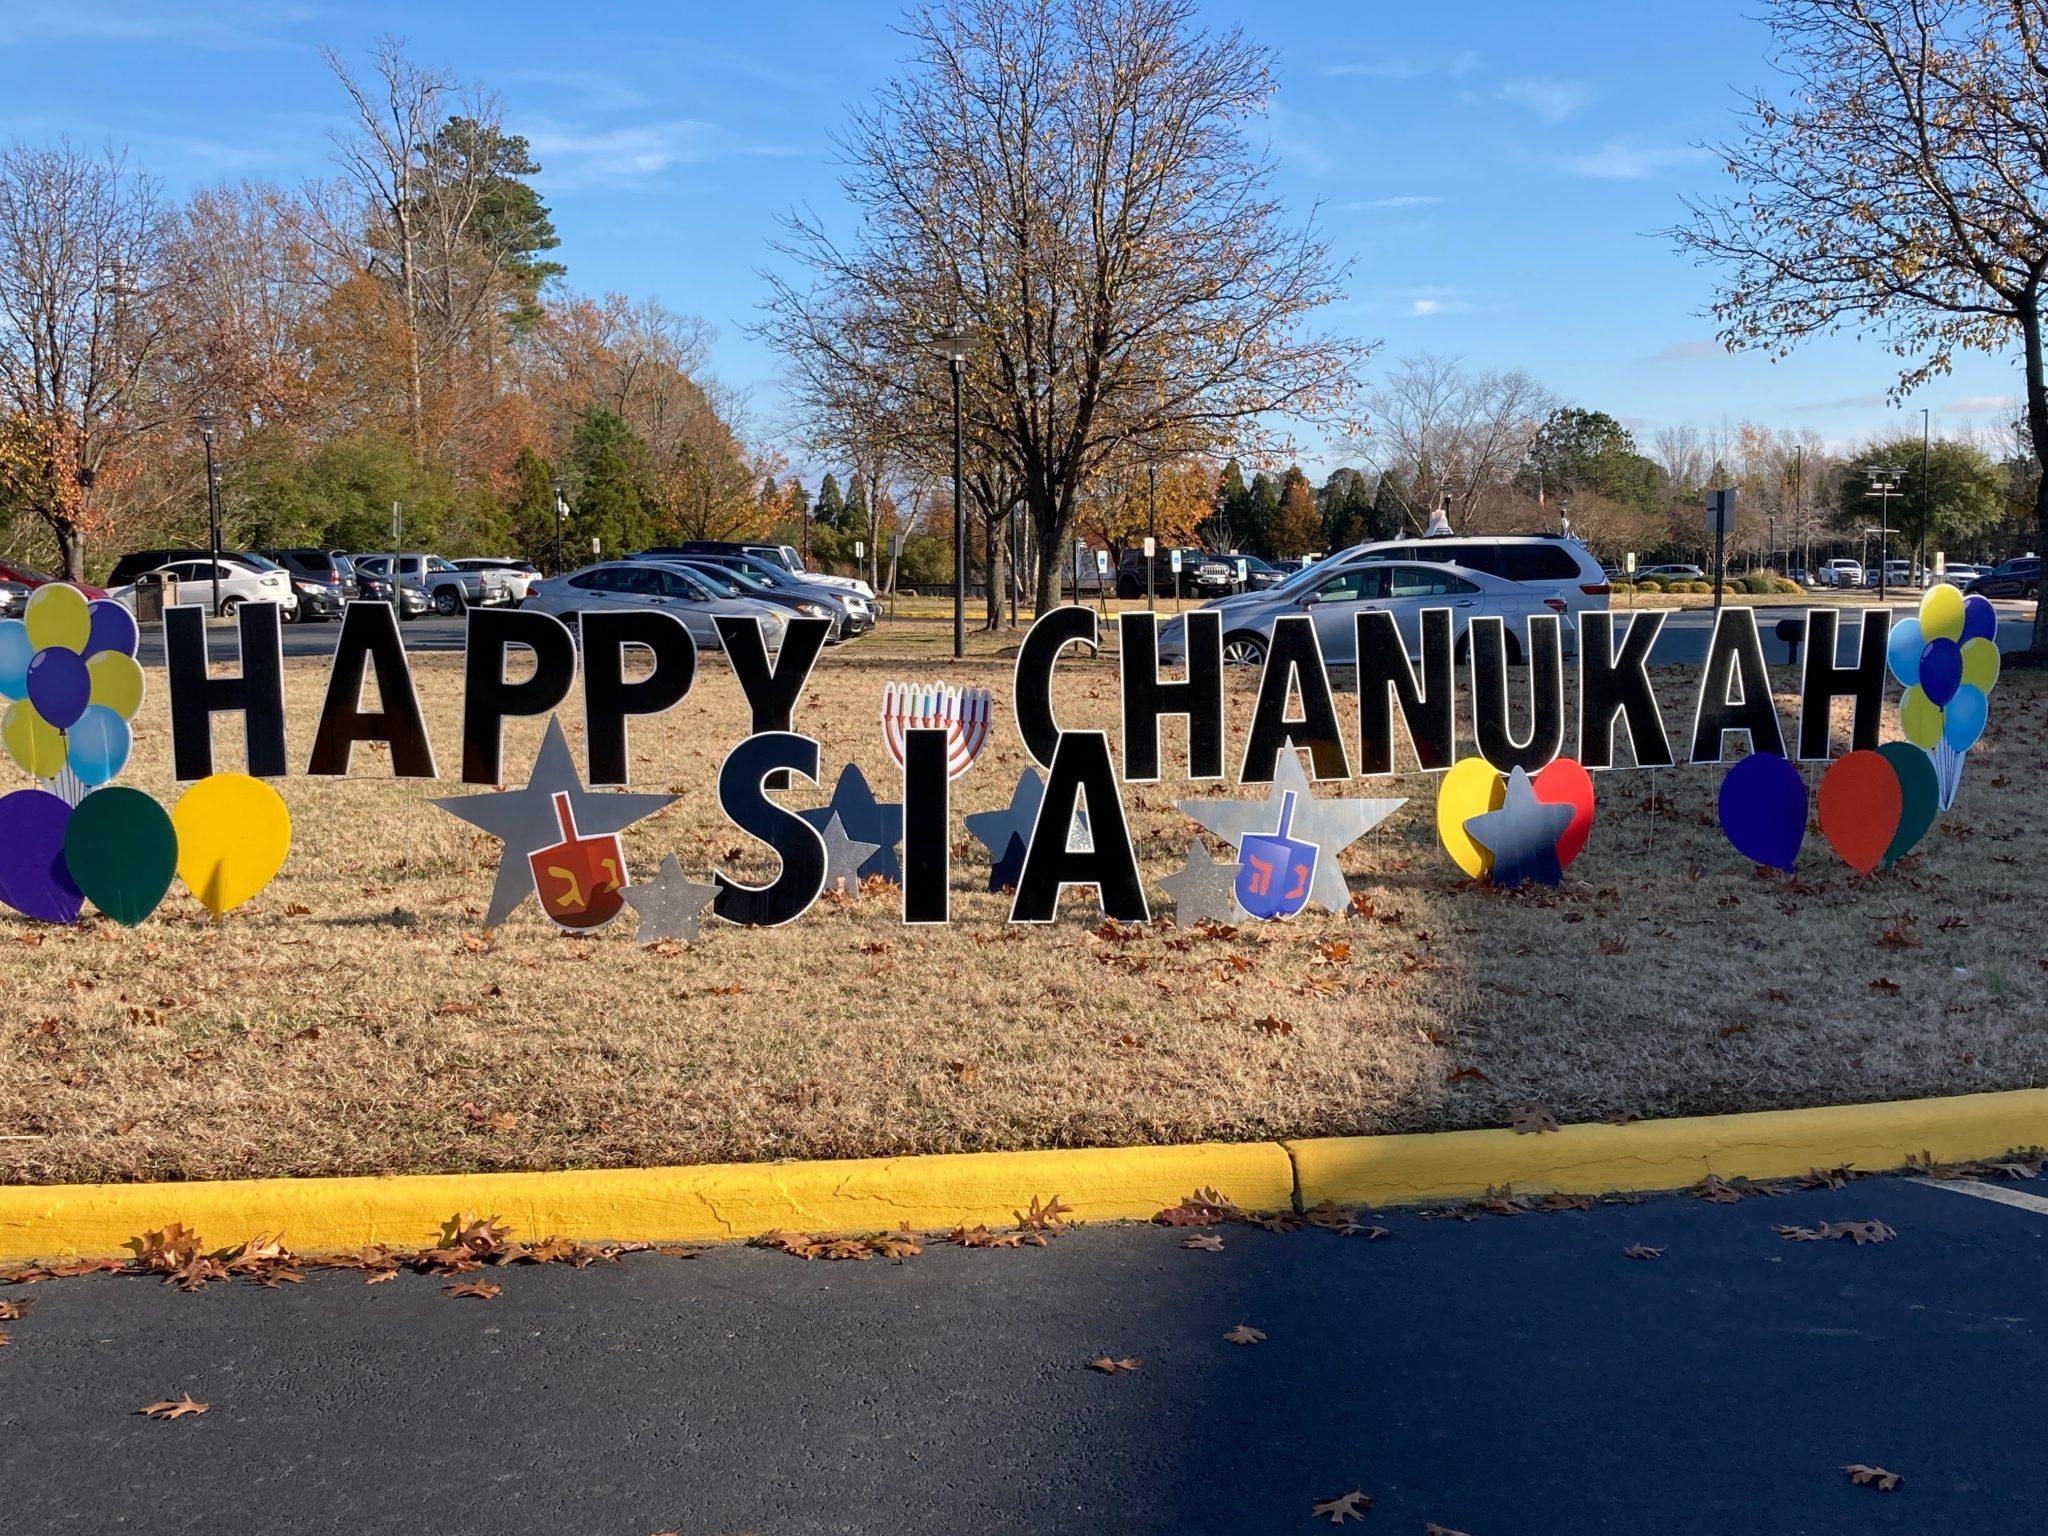 Celebrating Chanukah 2020 at the Strelitz International Academy